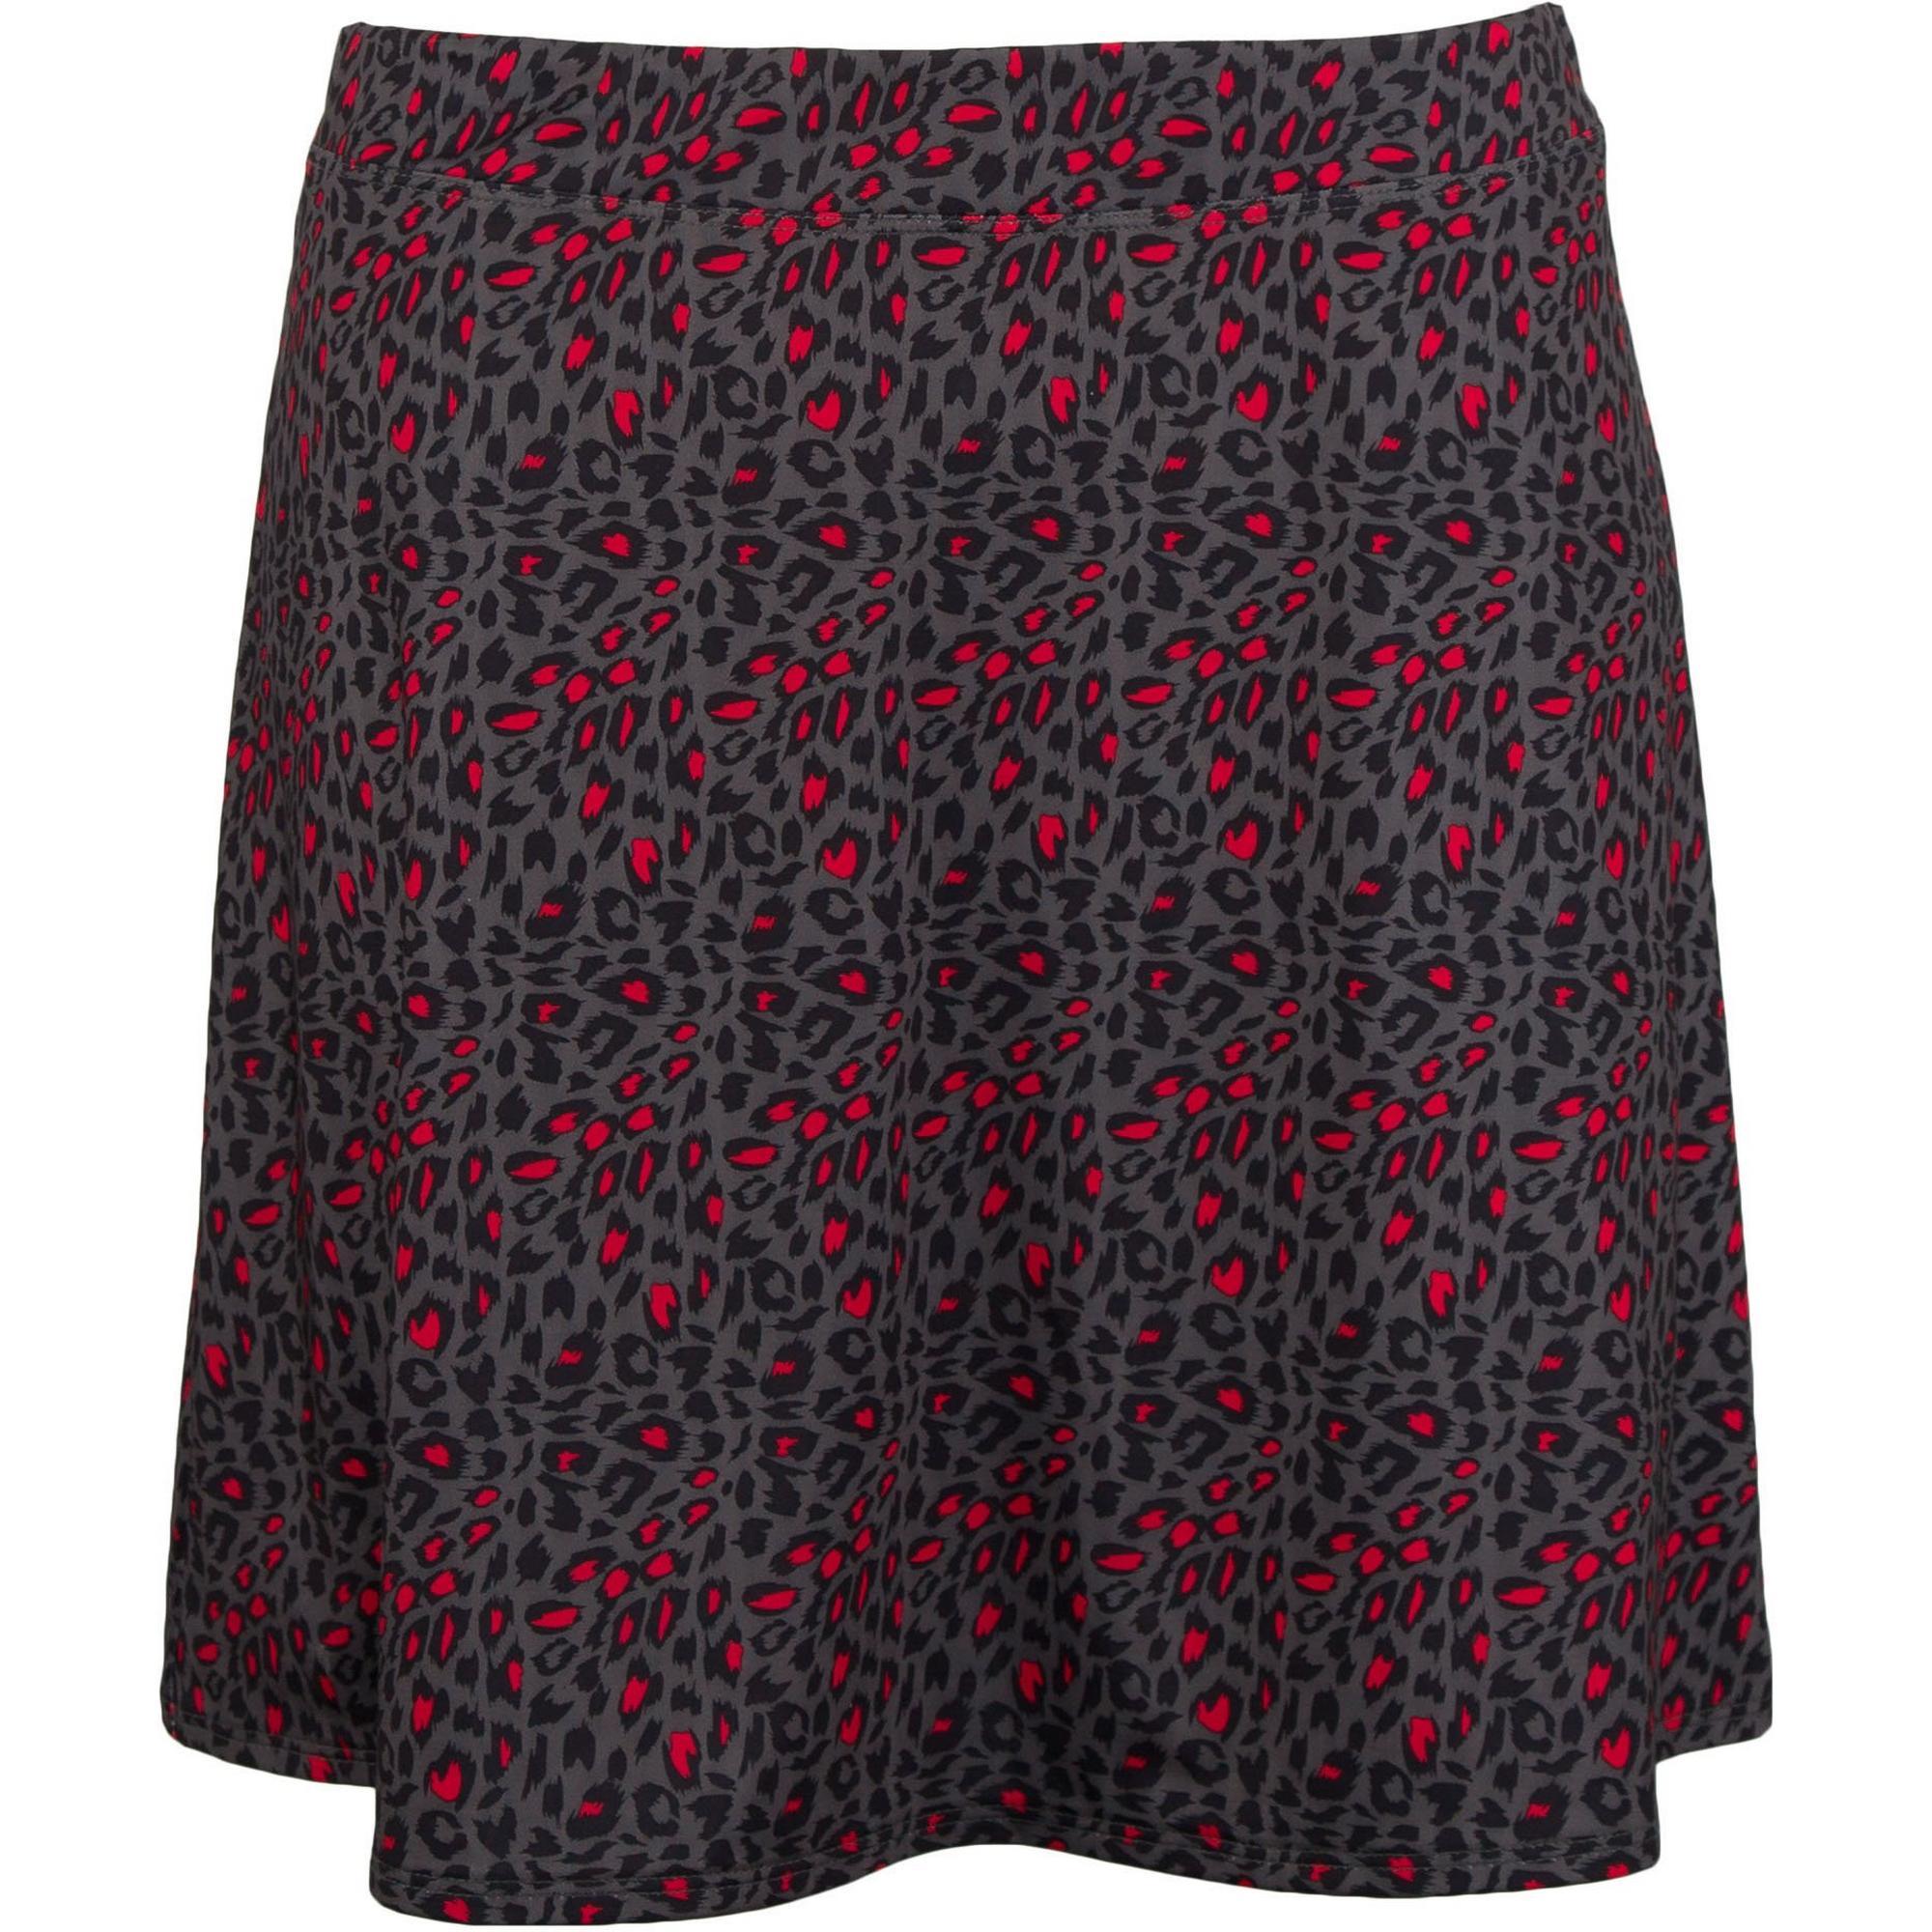 Womens Animal Print Swing Knit Skort